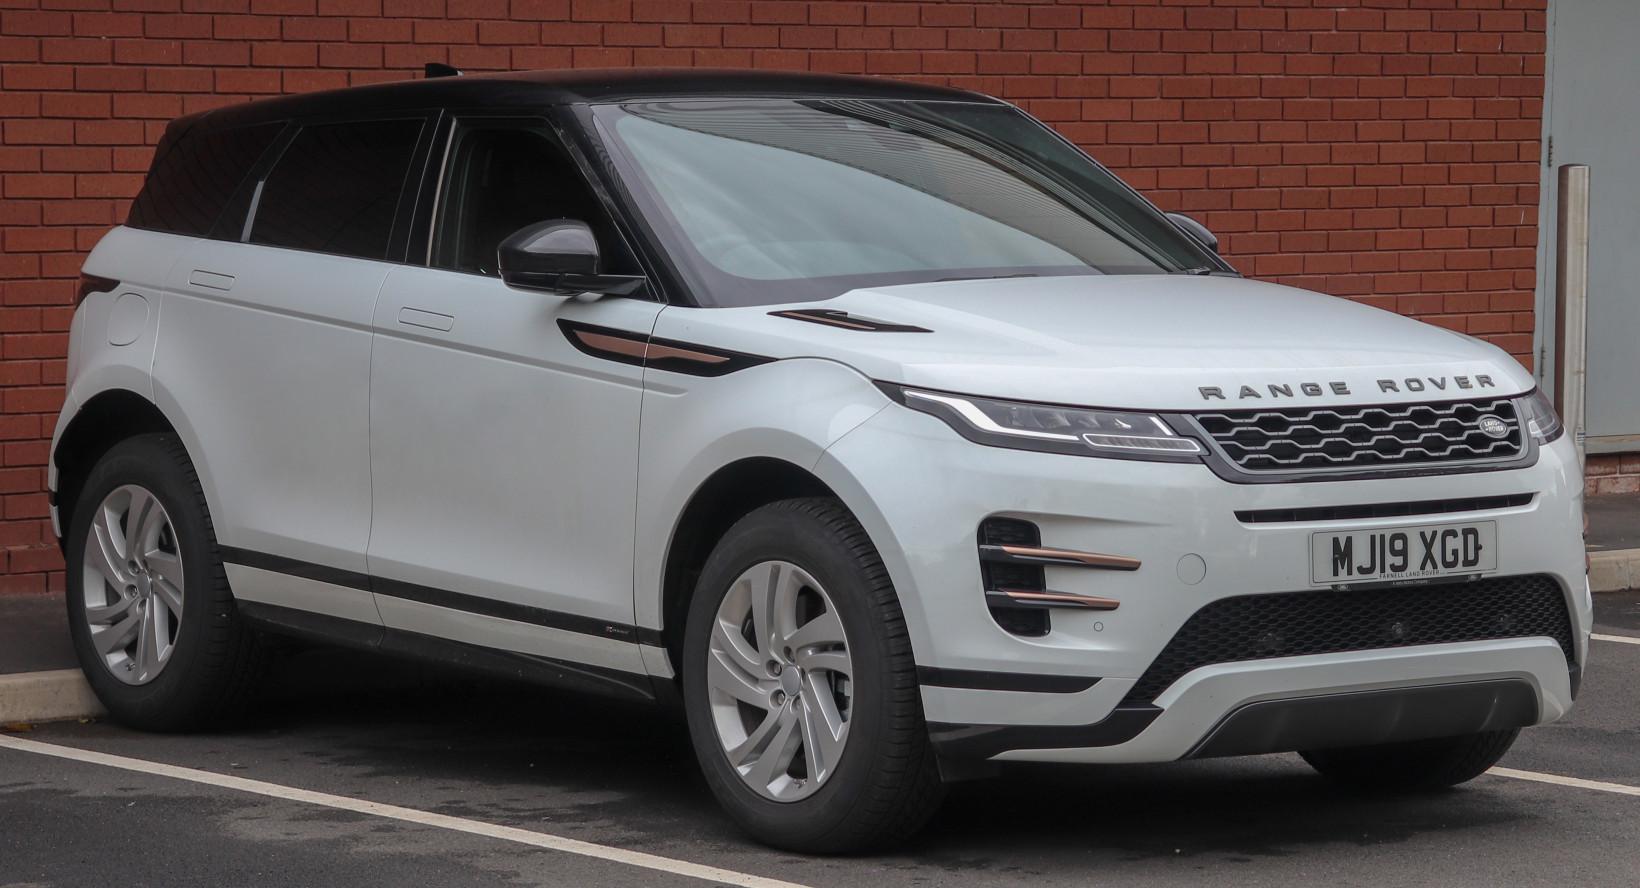 land rover, range rover, car, future, level 1, cruise control